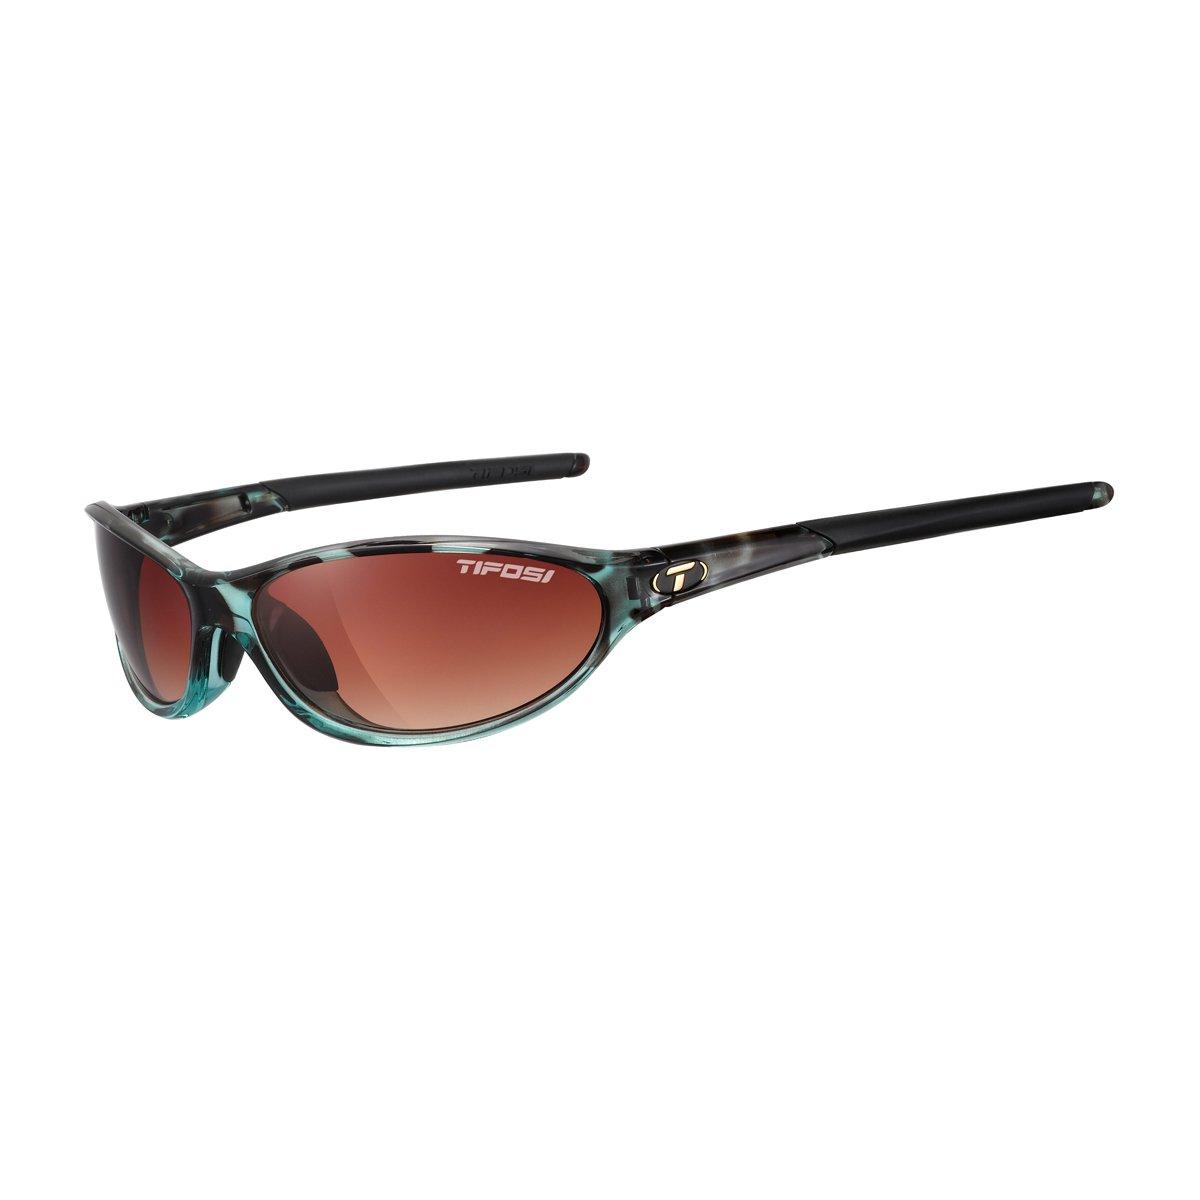 Tifosi ALPE 2.0 Blue Tortoise Brown Sunglasses